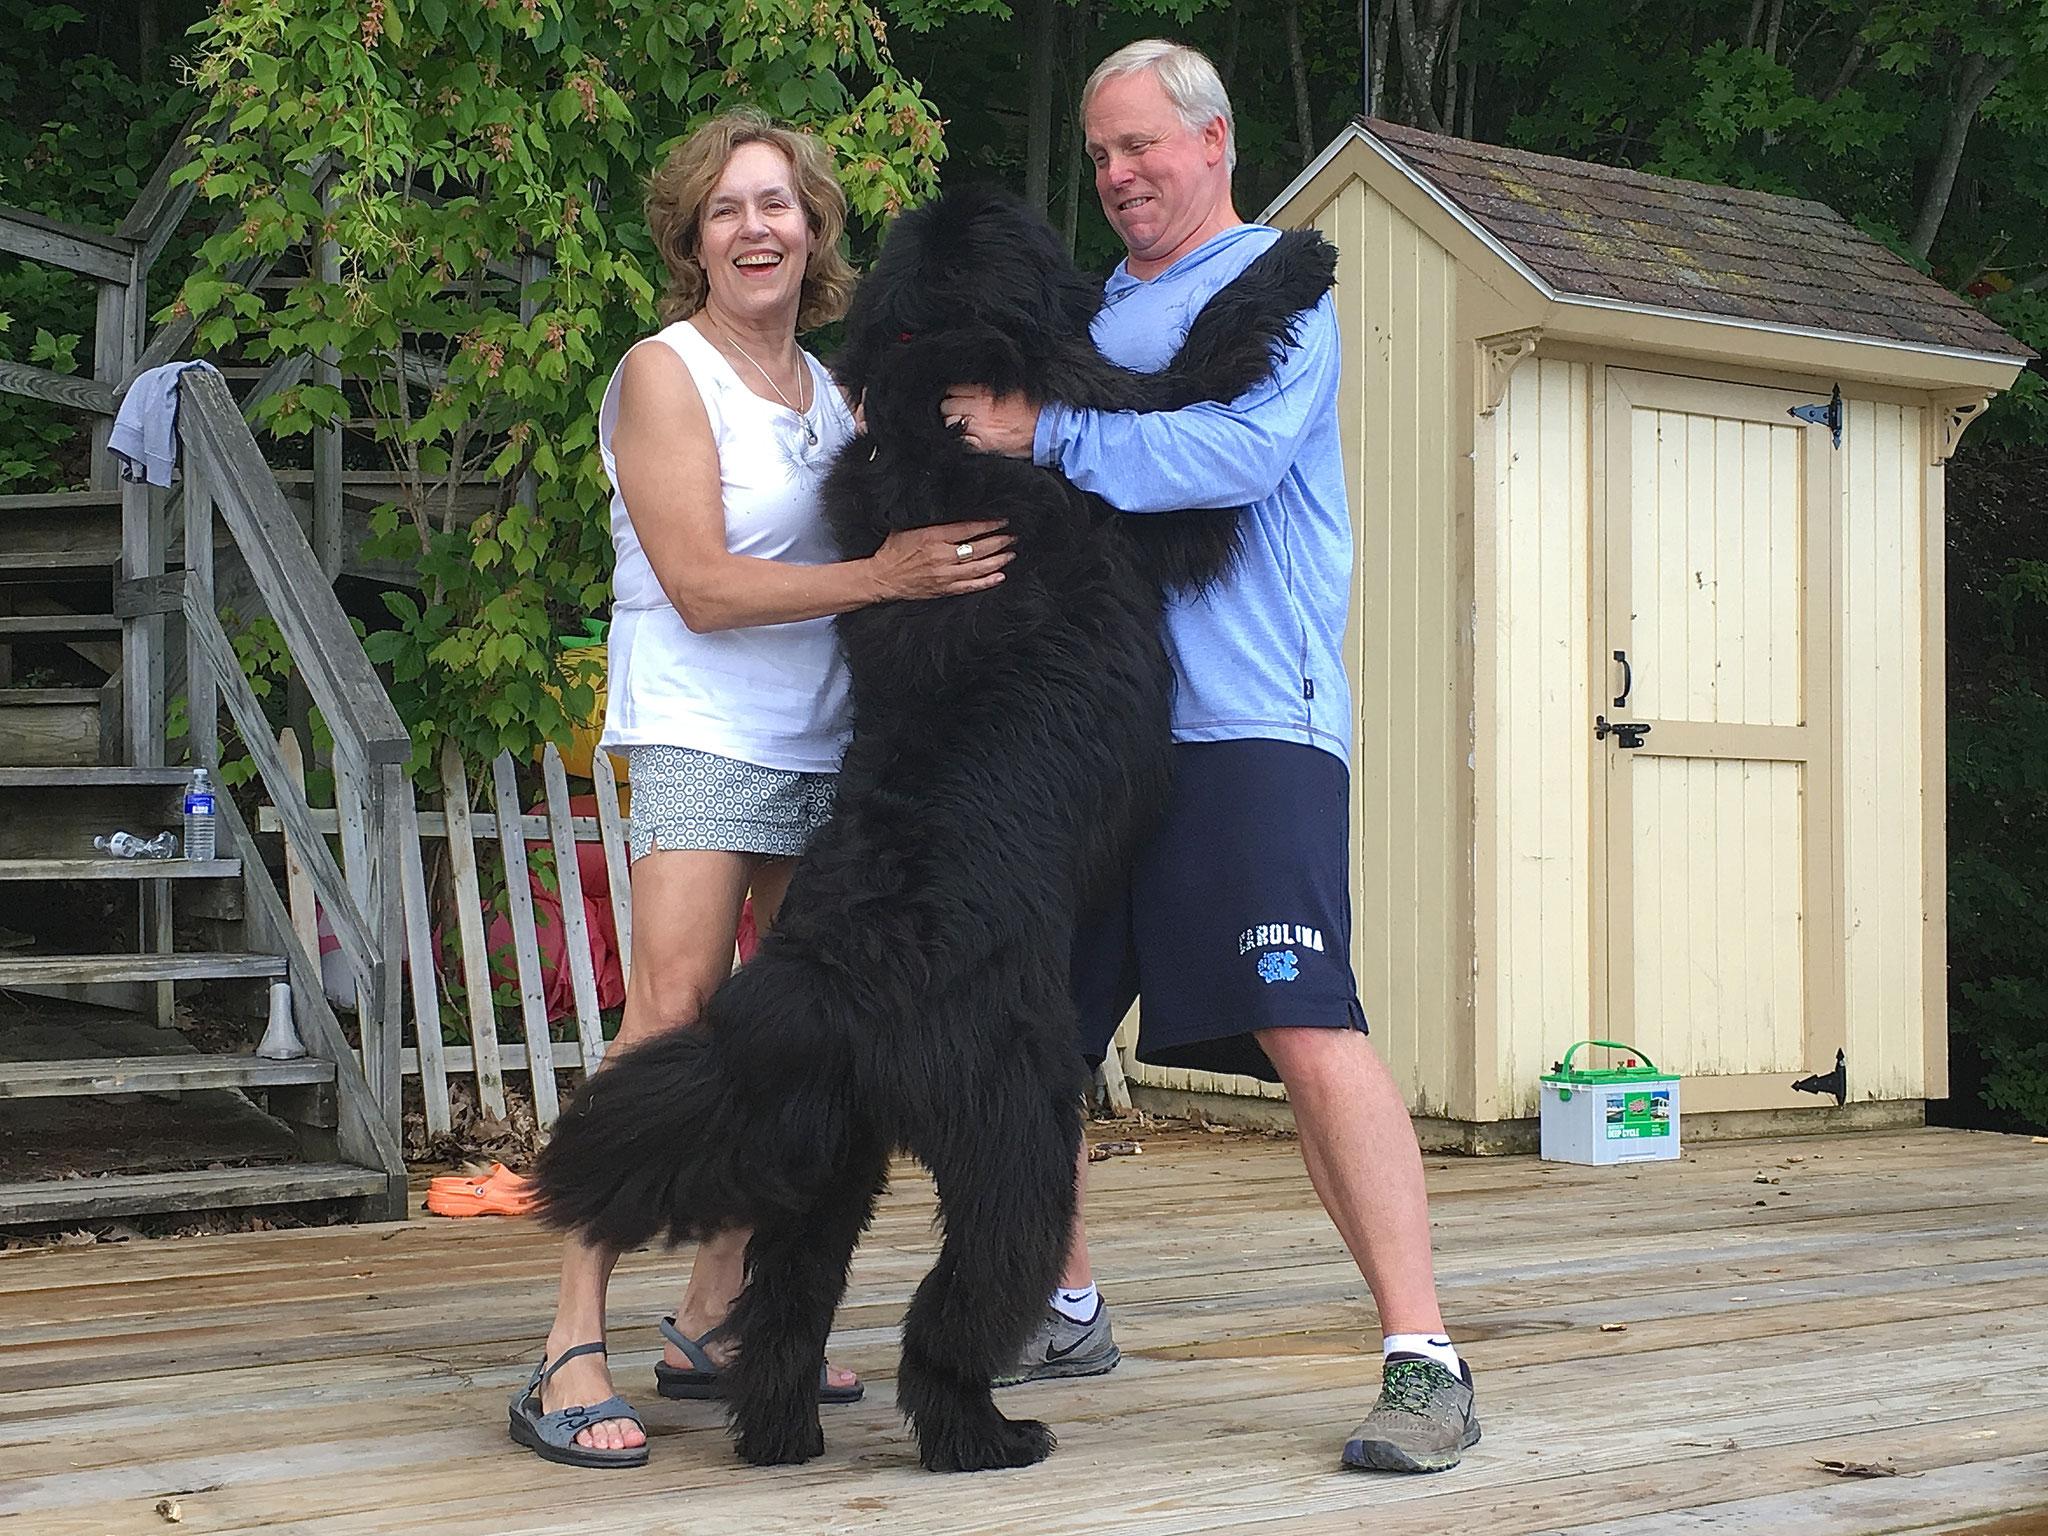 Lorraine & Stuart Jr., and Lola, the dog  July 4, 2017